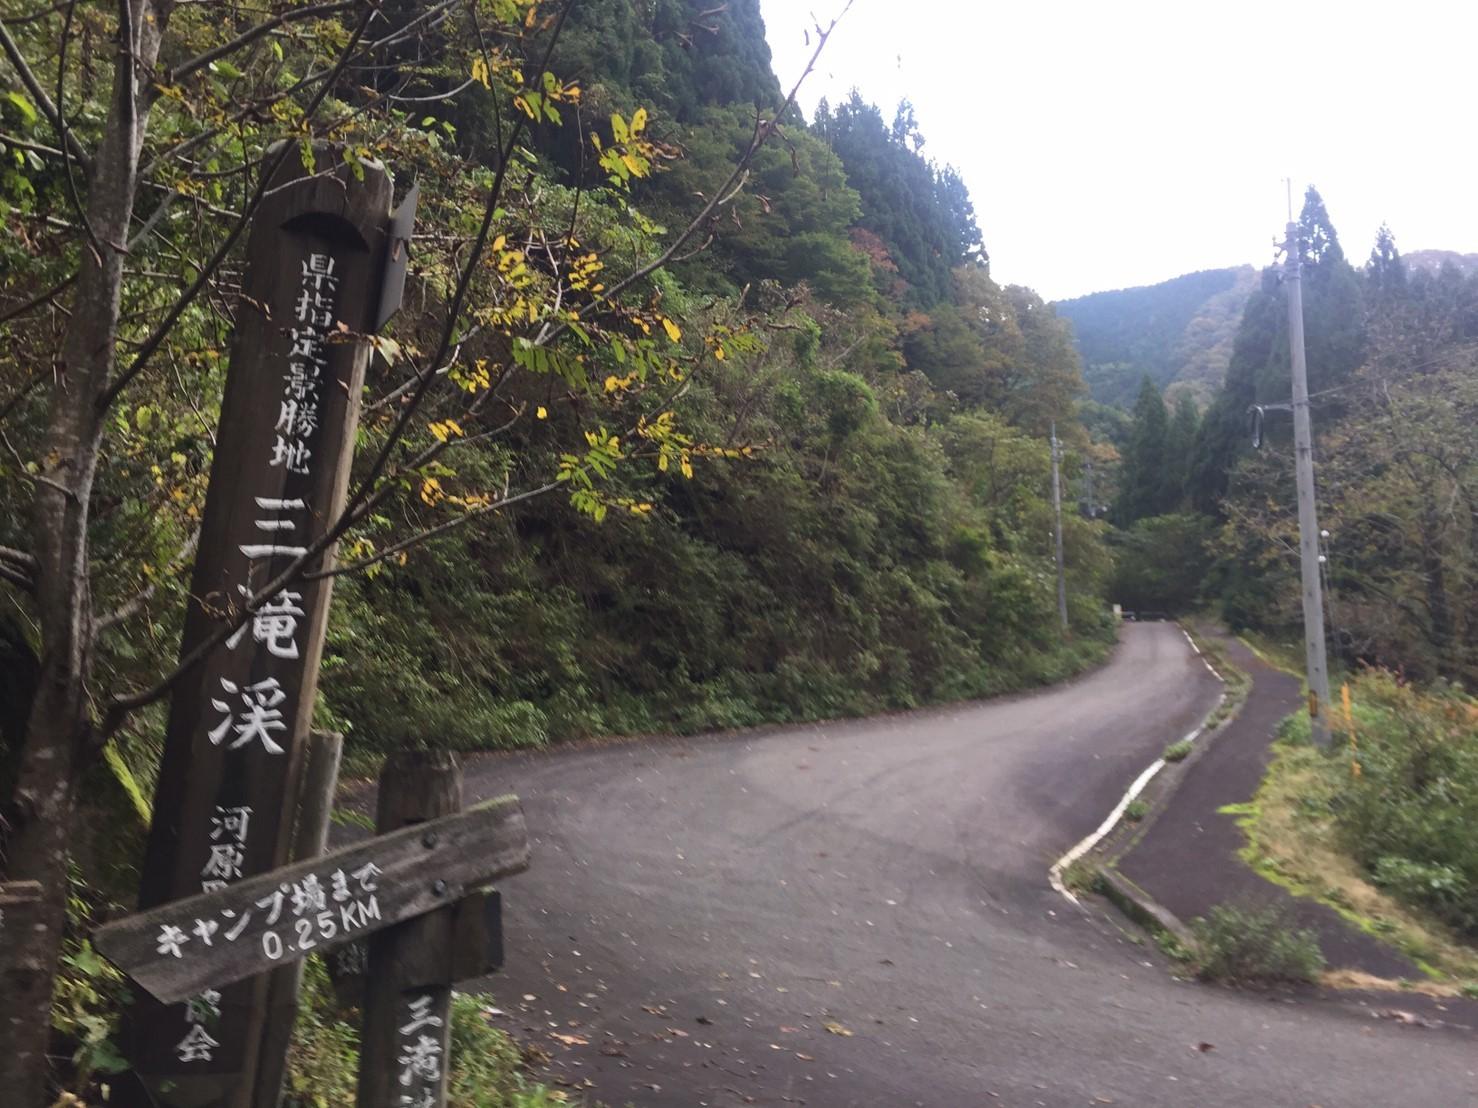 西郷工芸祭り・三滝渓_e0115904_17063399.jpg